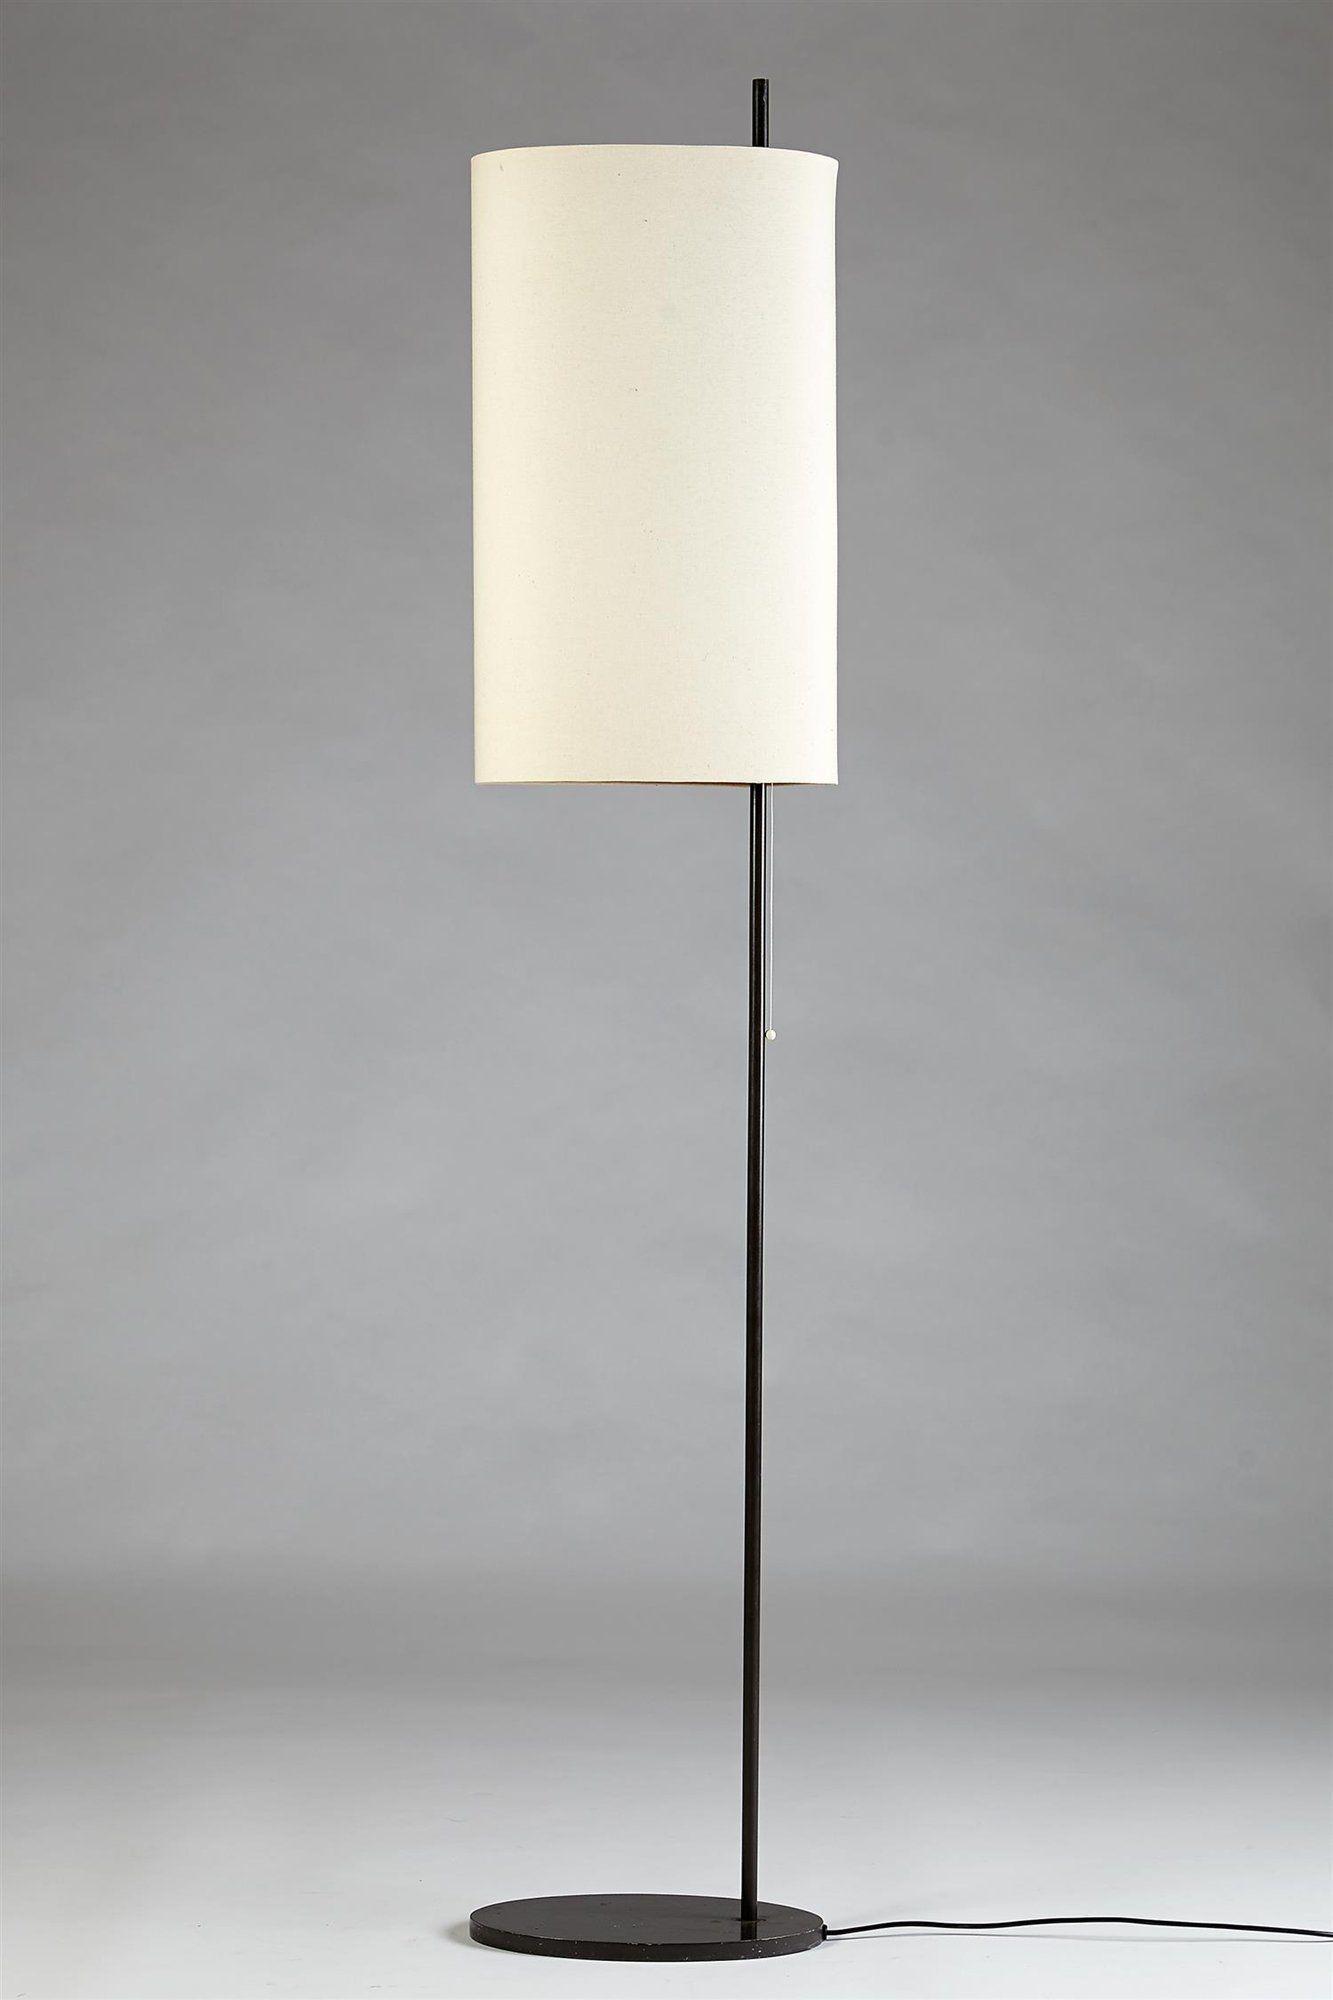 Arne Jacobsen Enameled Metal Royal Floor Lamp For Louis Poulsen